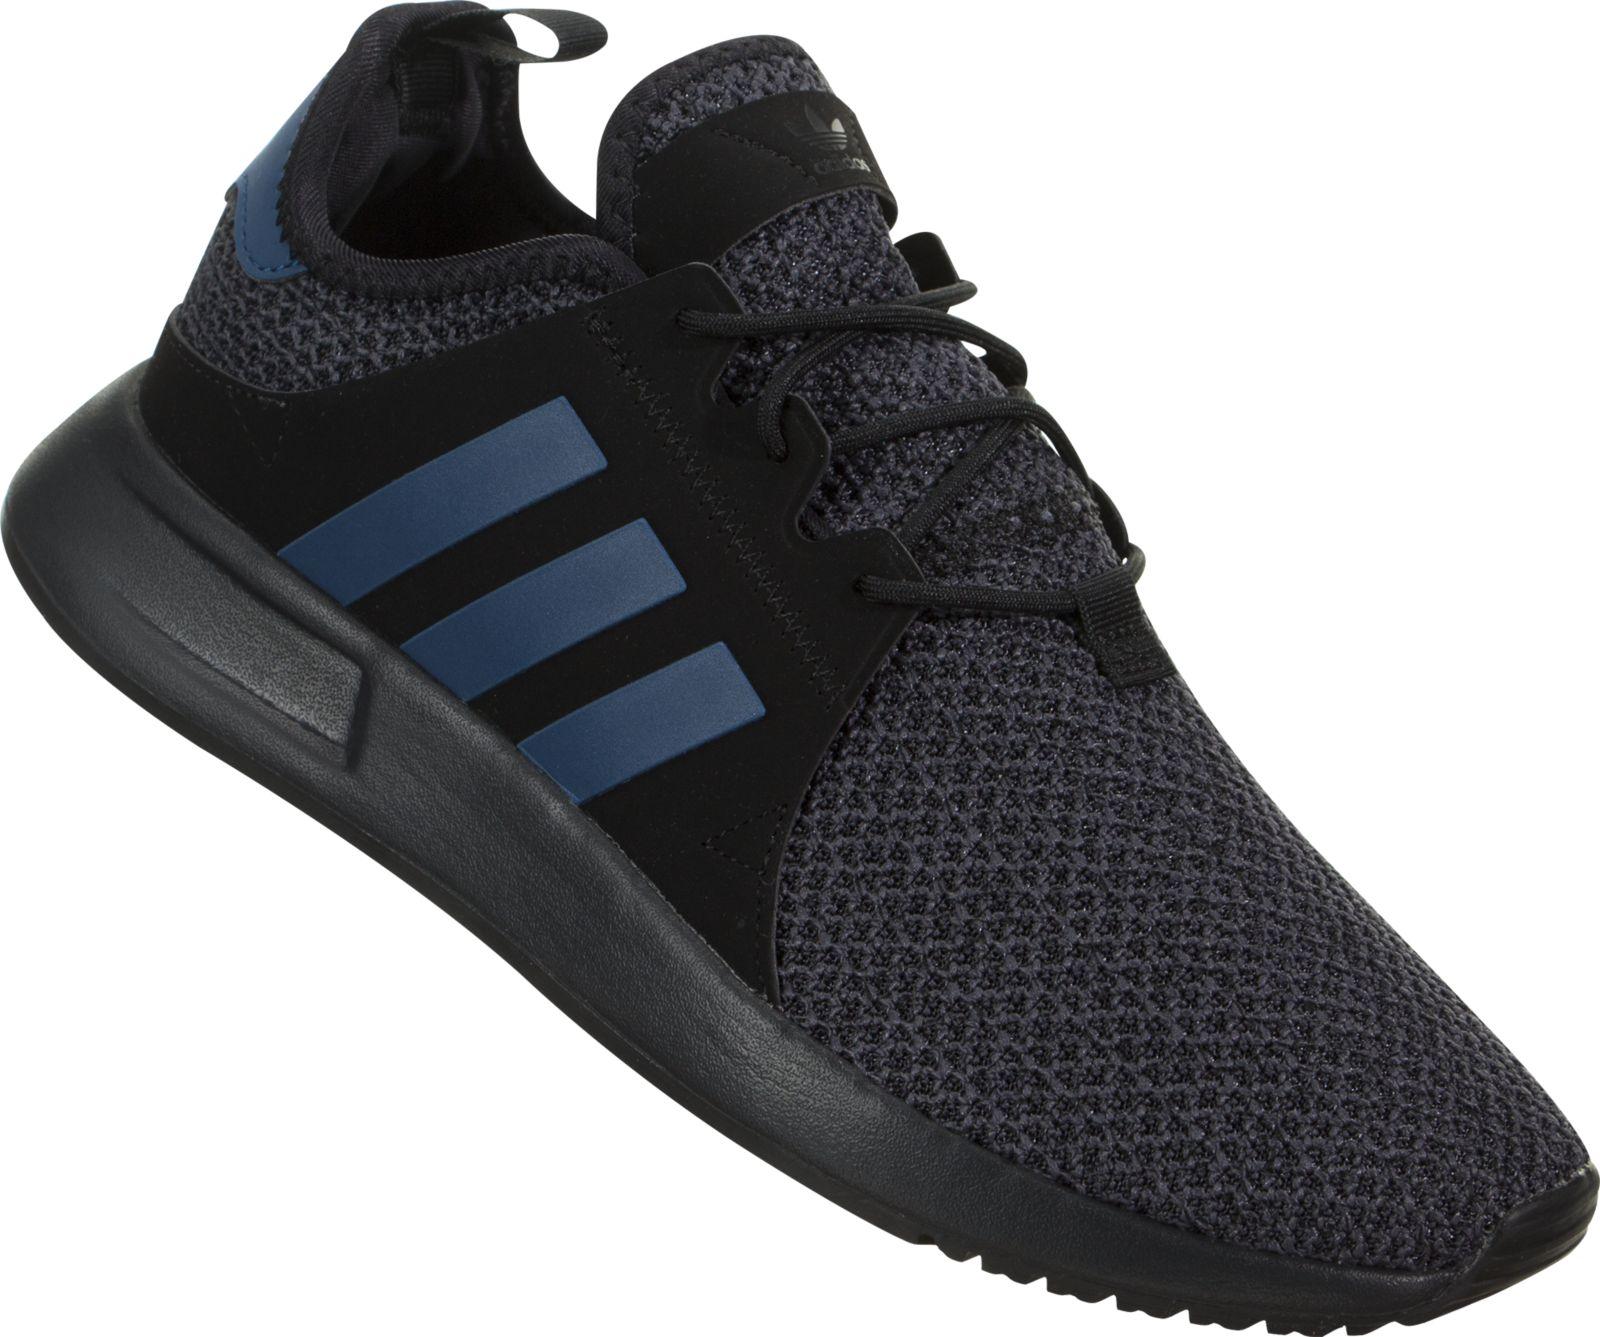 Adidas X A Infrarossi A Due Toni Scarpe Per Bambini Nero / Blu Notte 6 Ebay Nucleo